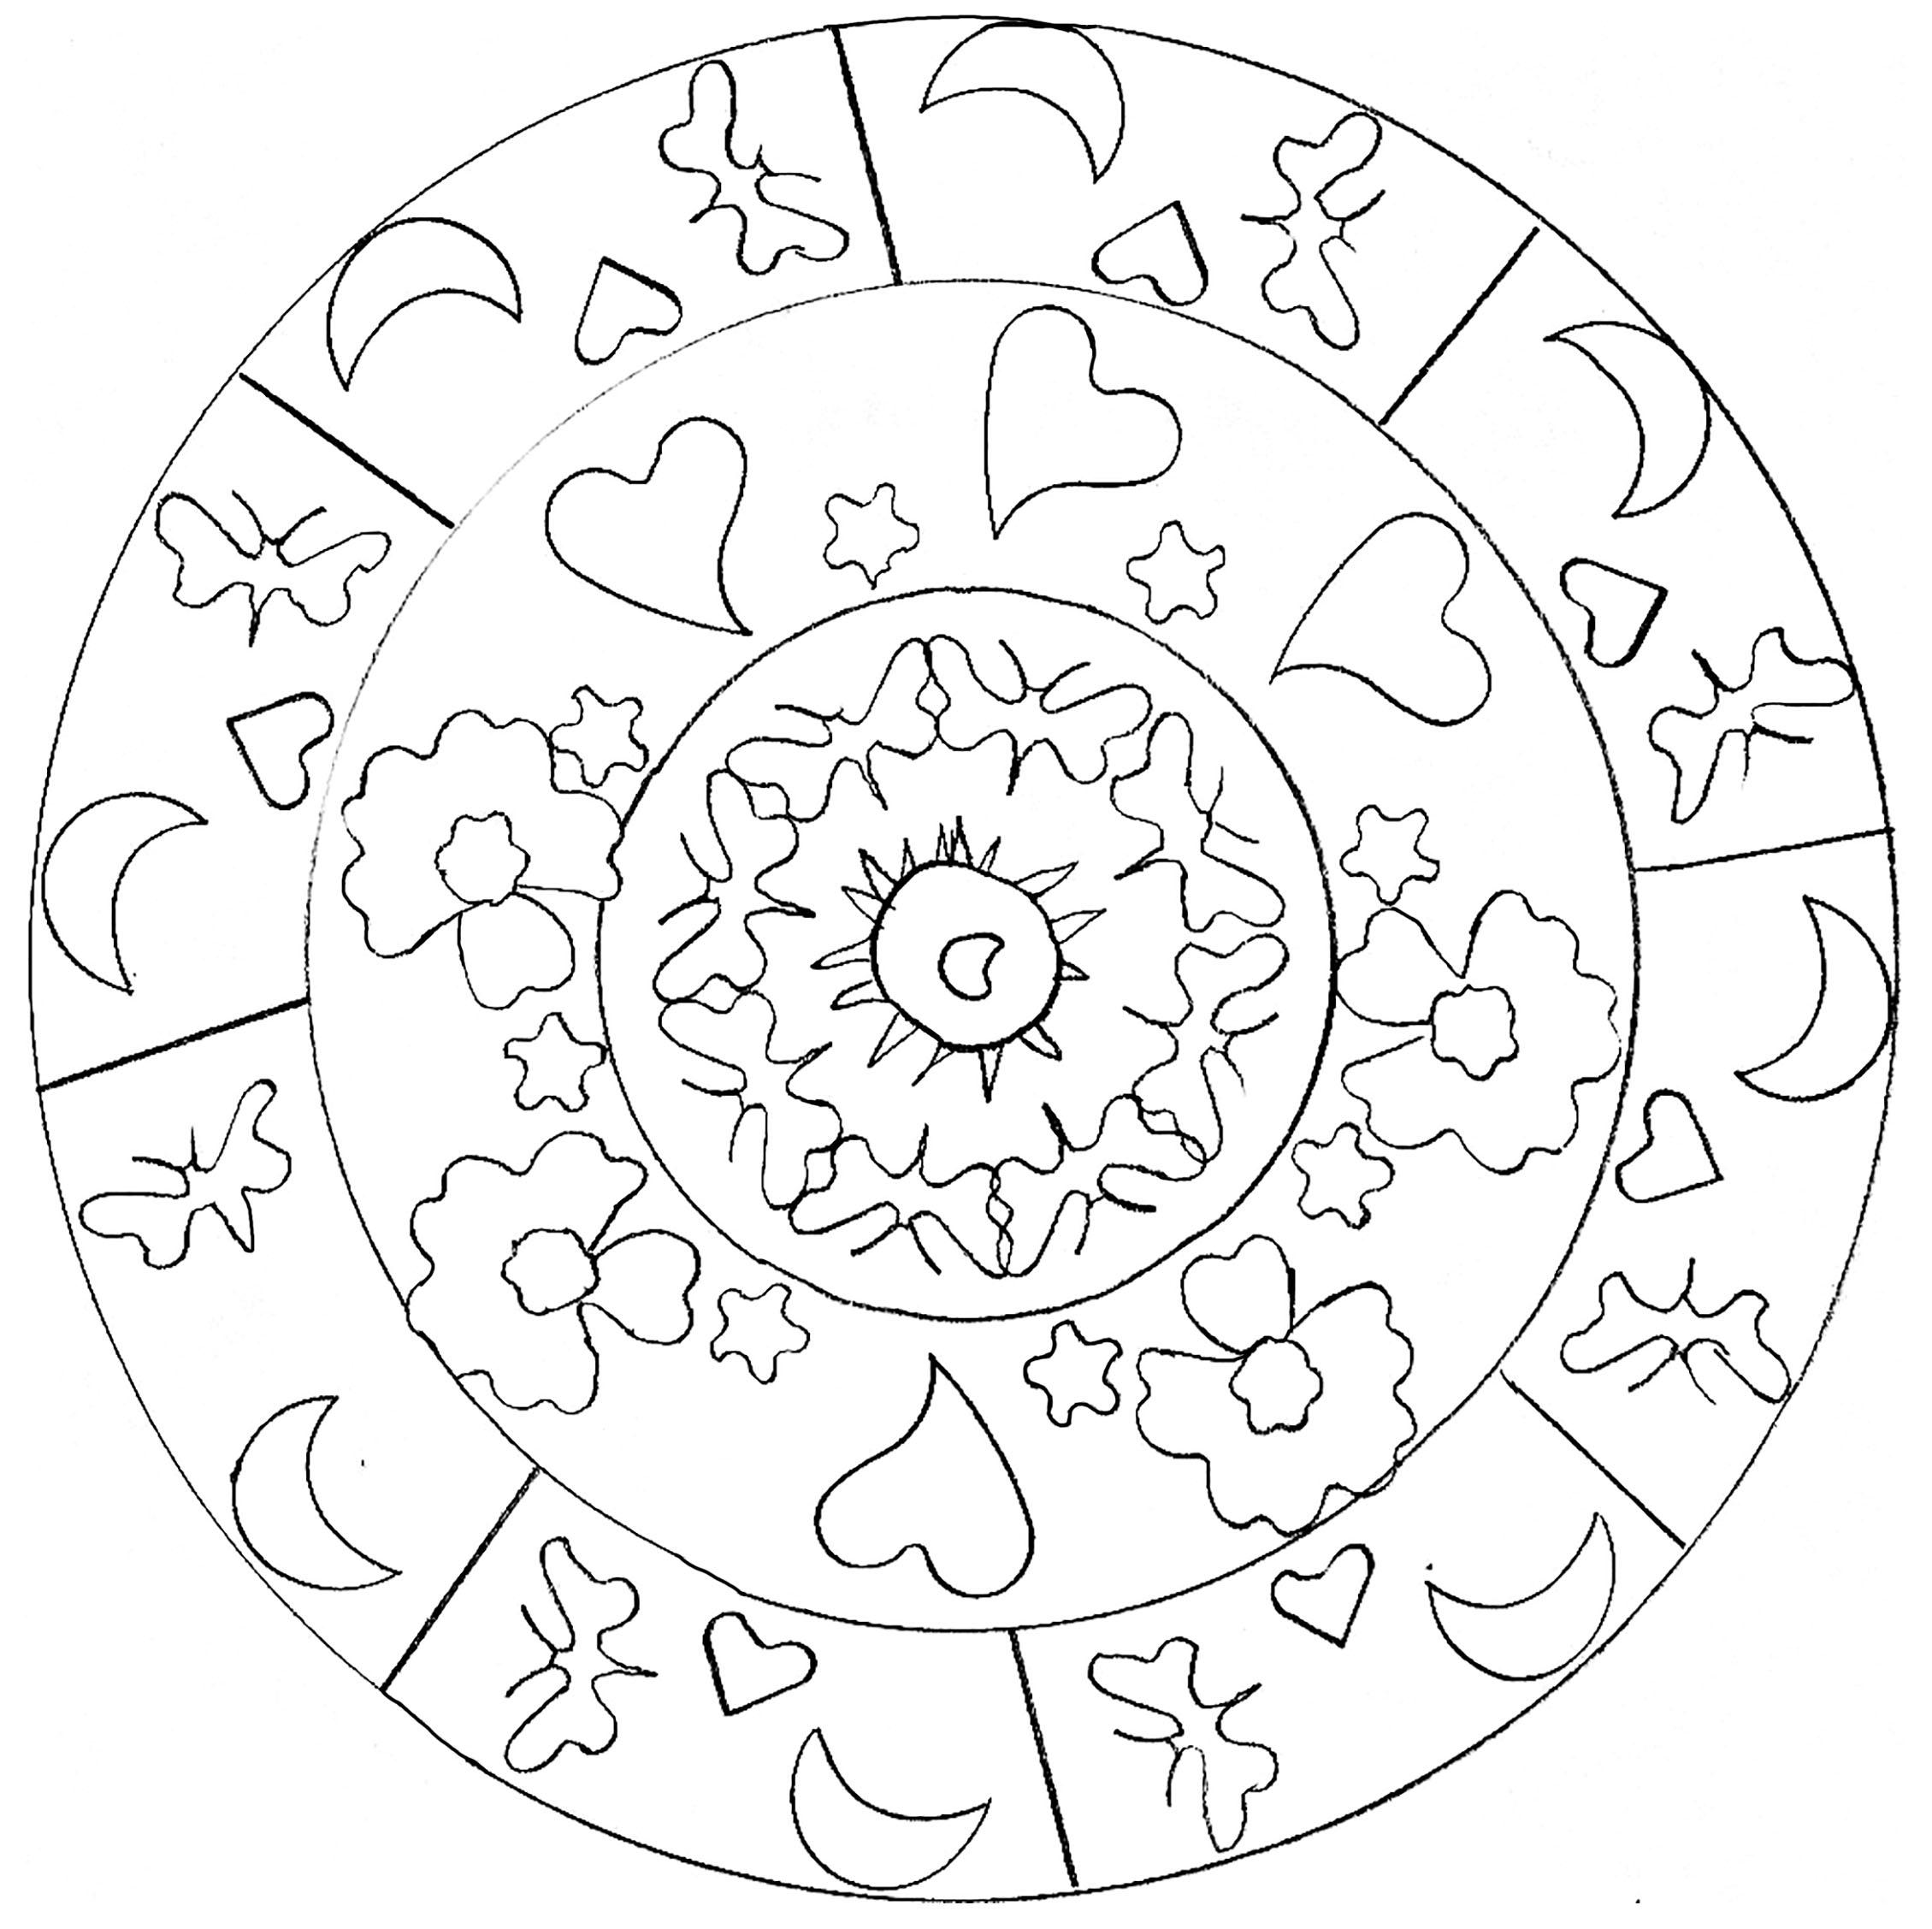 Cute Mandala drawing with moon, heart and stars